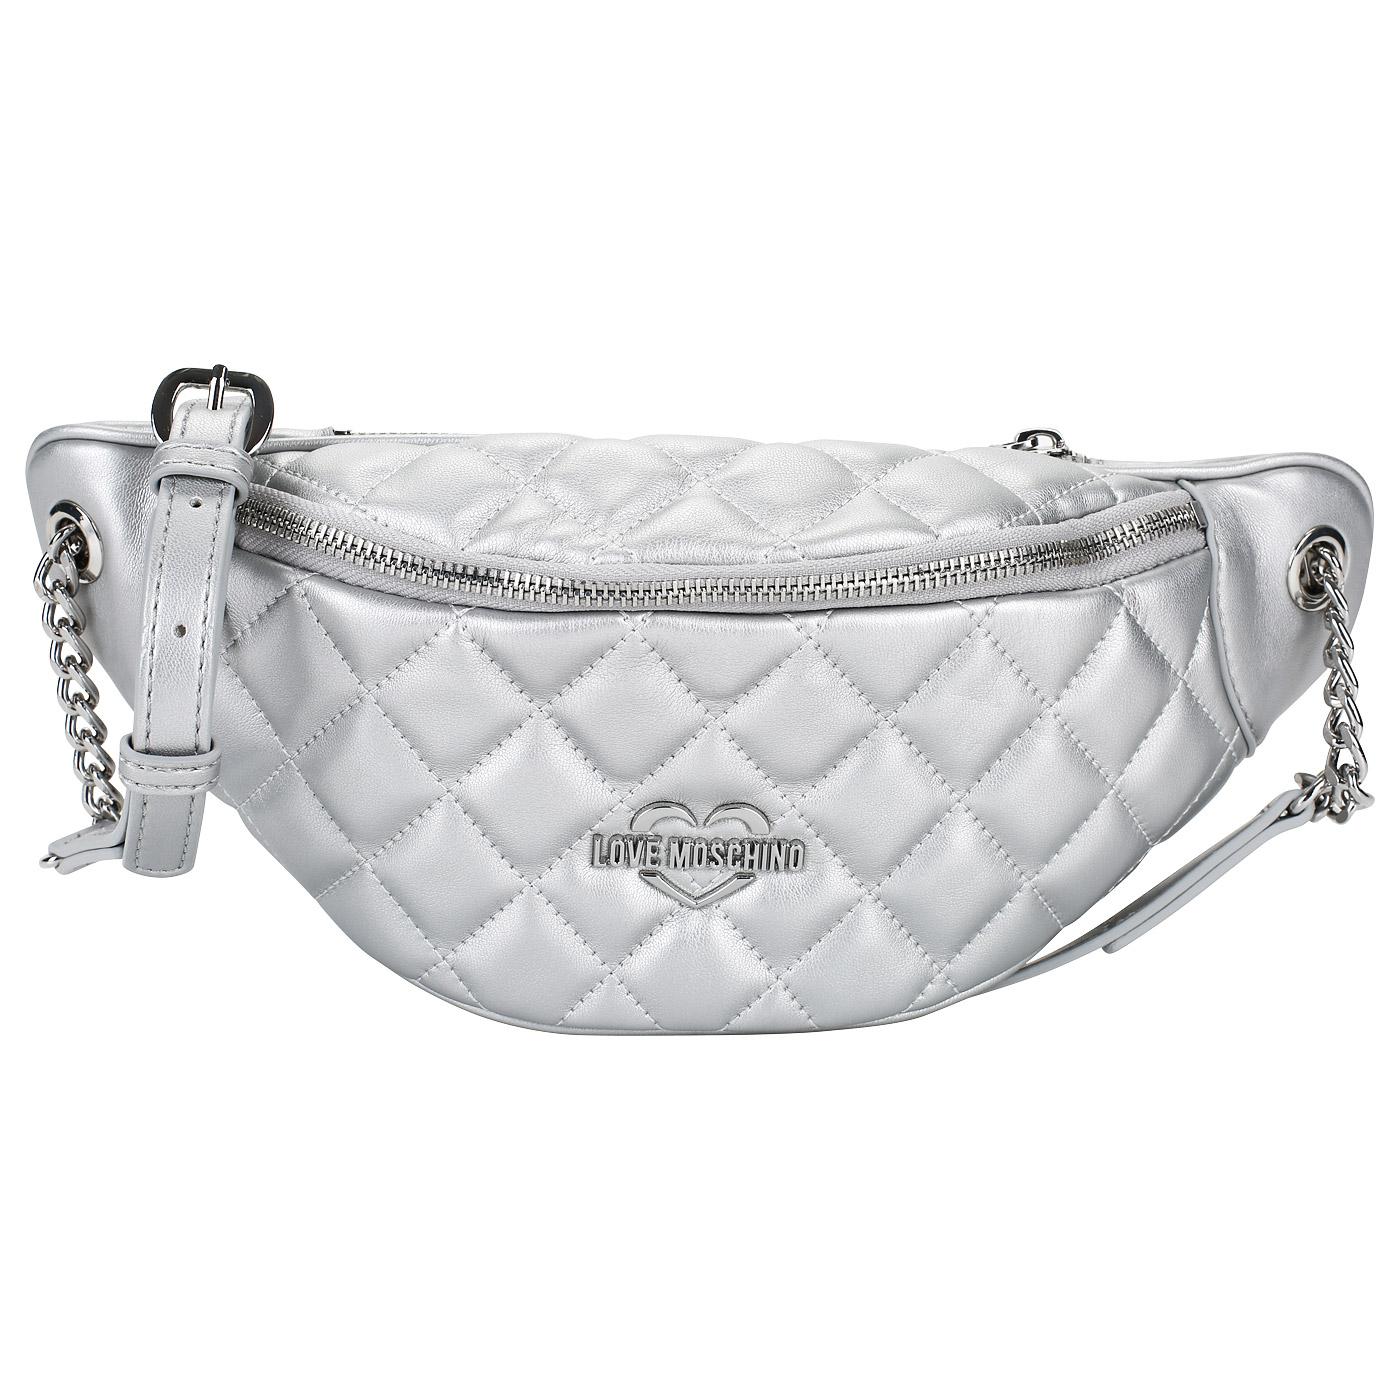 7476a48e6515 ... Женская поясная сумка на молнии Love Moschino Quilted Metallic ...